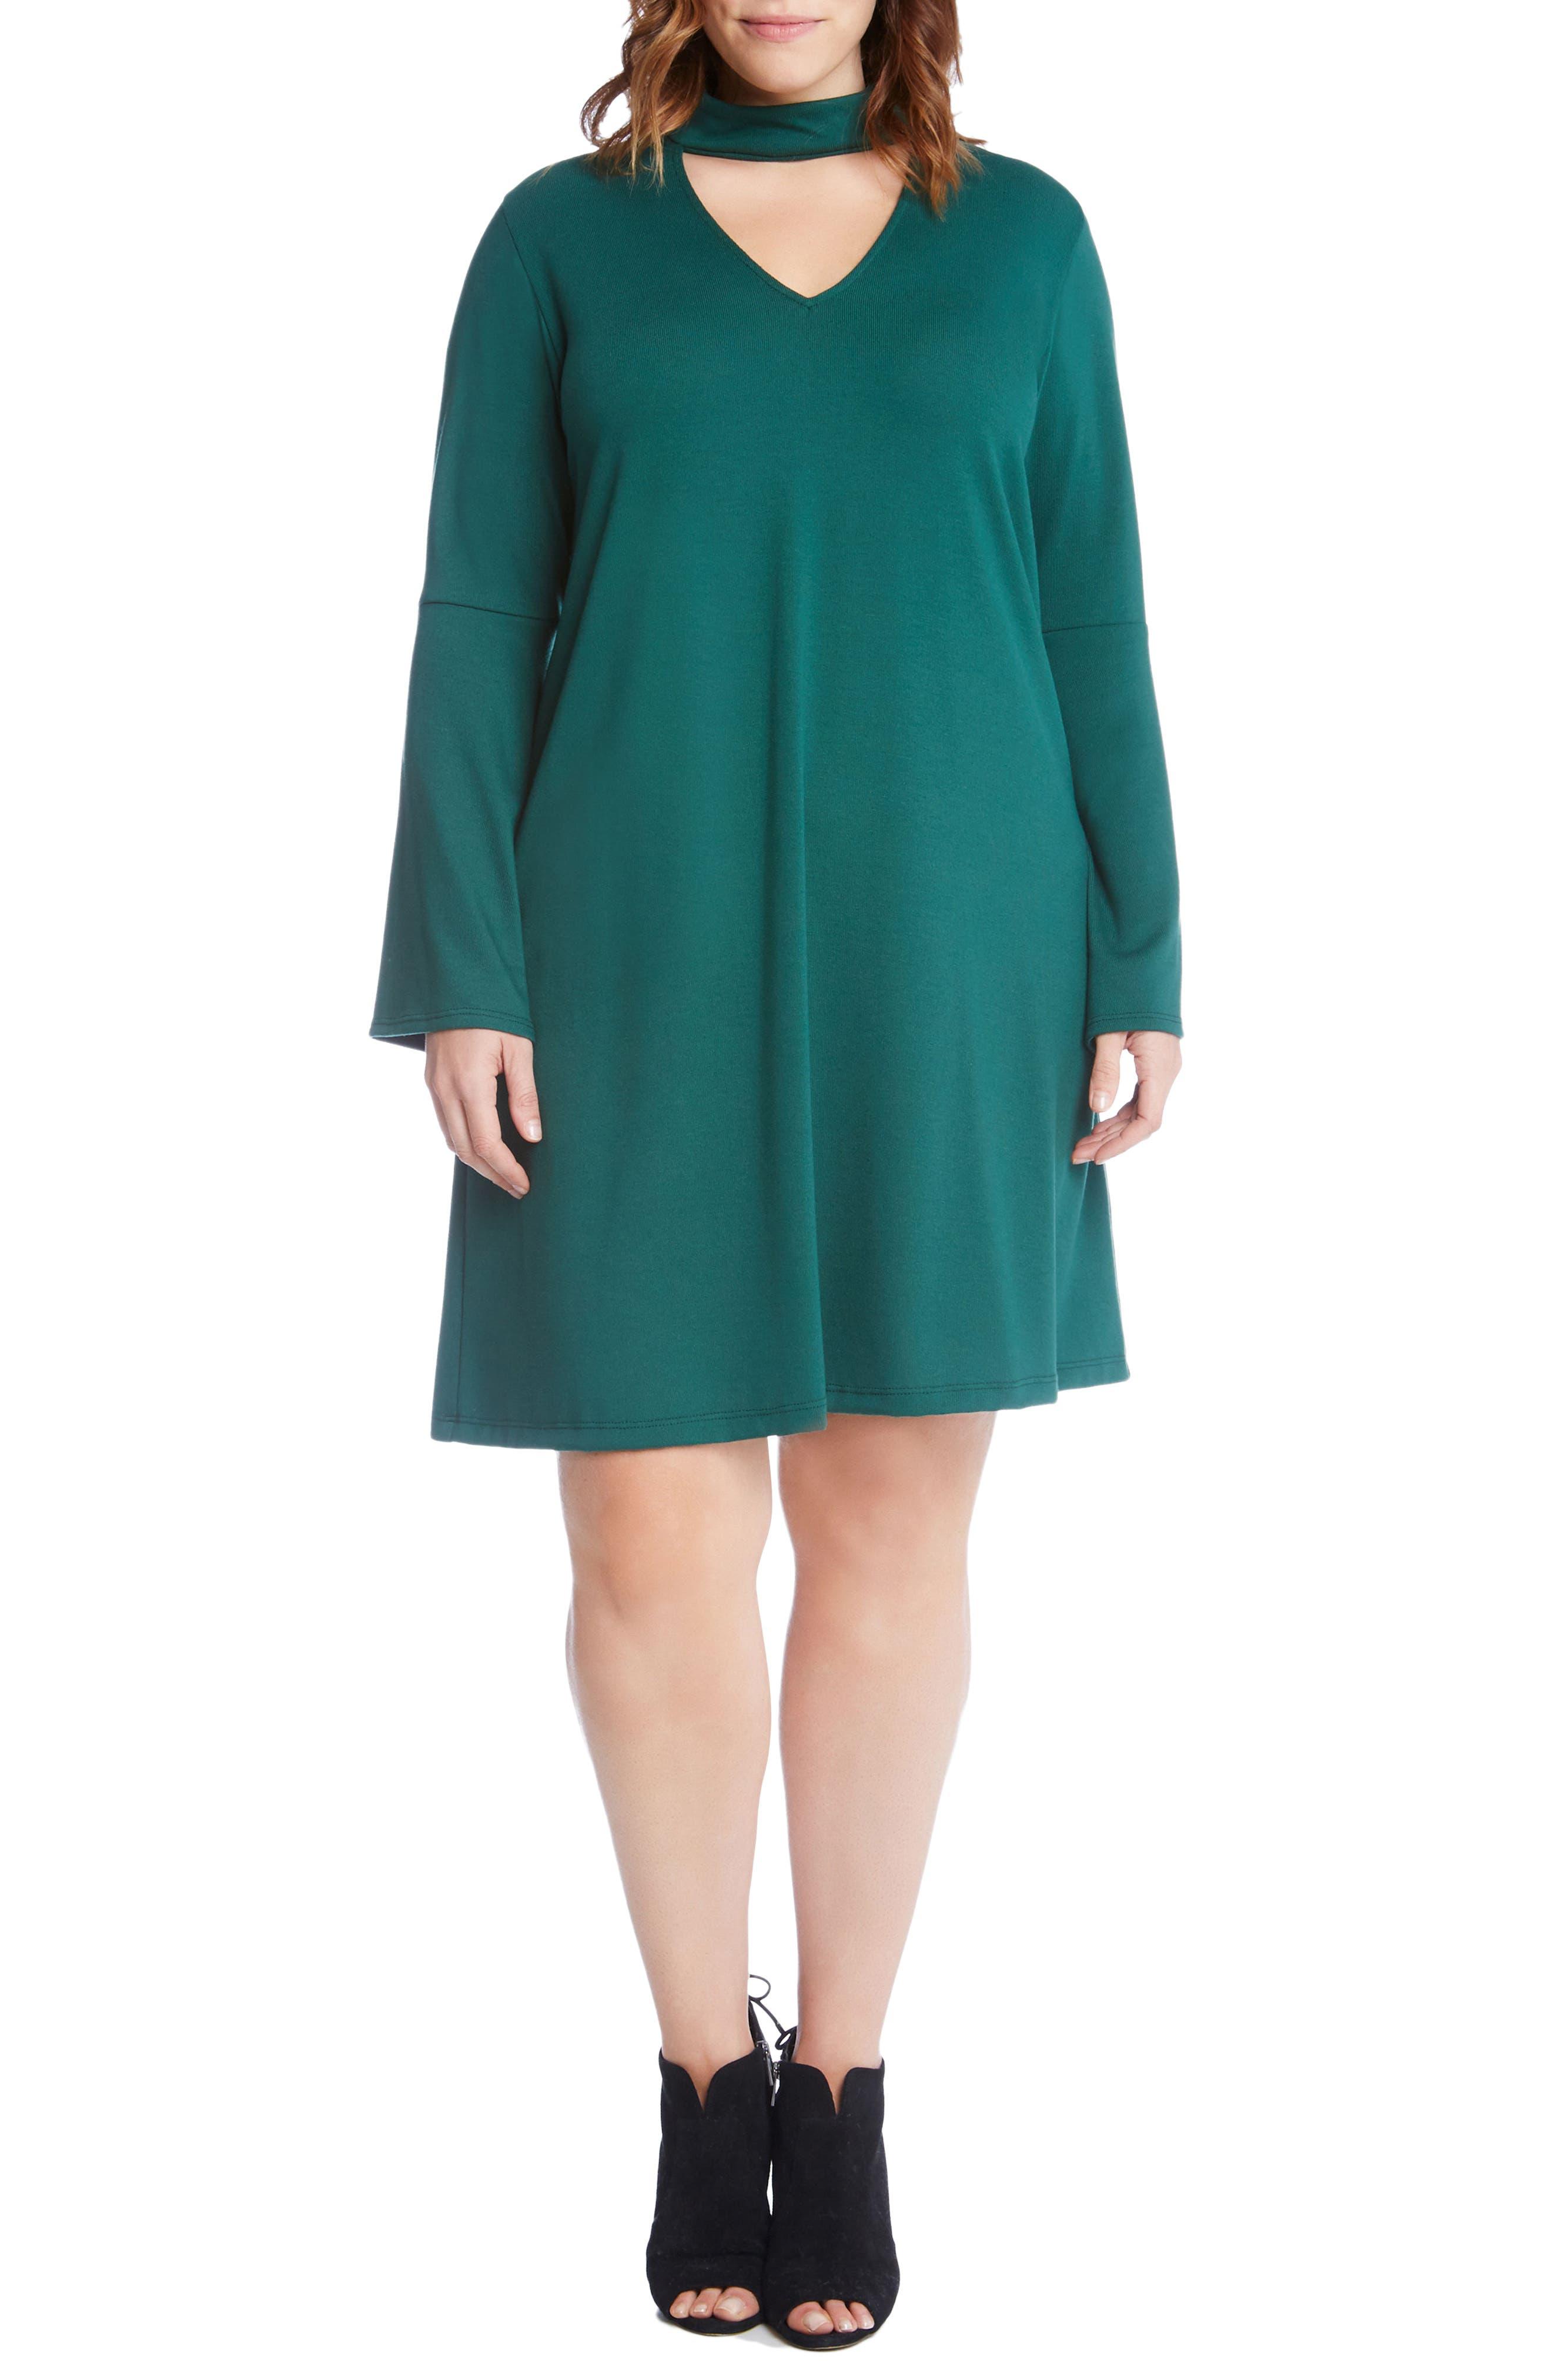 Alternate Image 1 Selected - Karen Kane Taylor Choker Neck A-Line Dress (Plus Size)